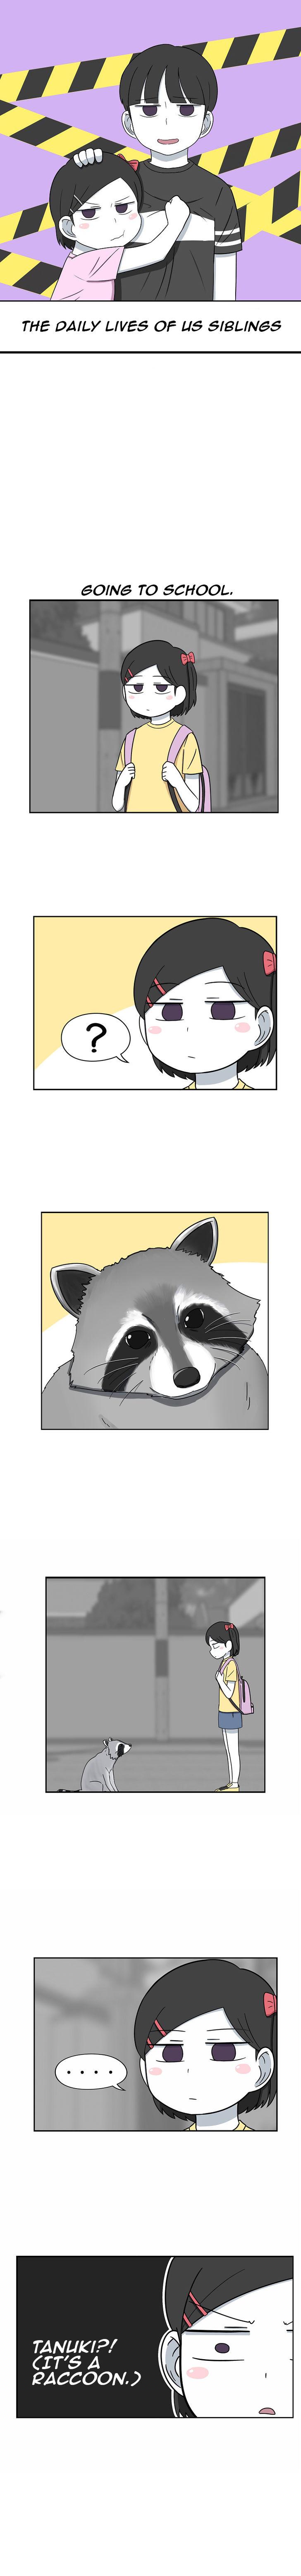 The Daily Lives of Us Siblings 30: Tanukis aren't Raccoons. at MangaFox